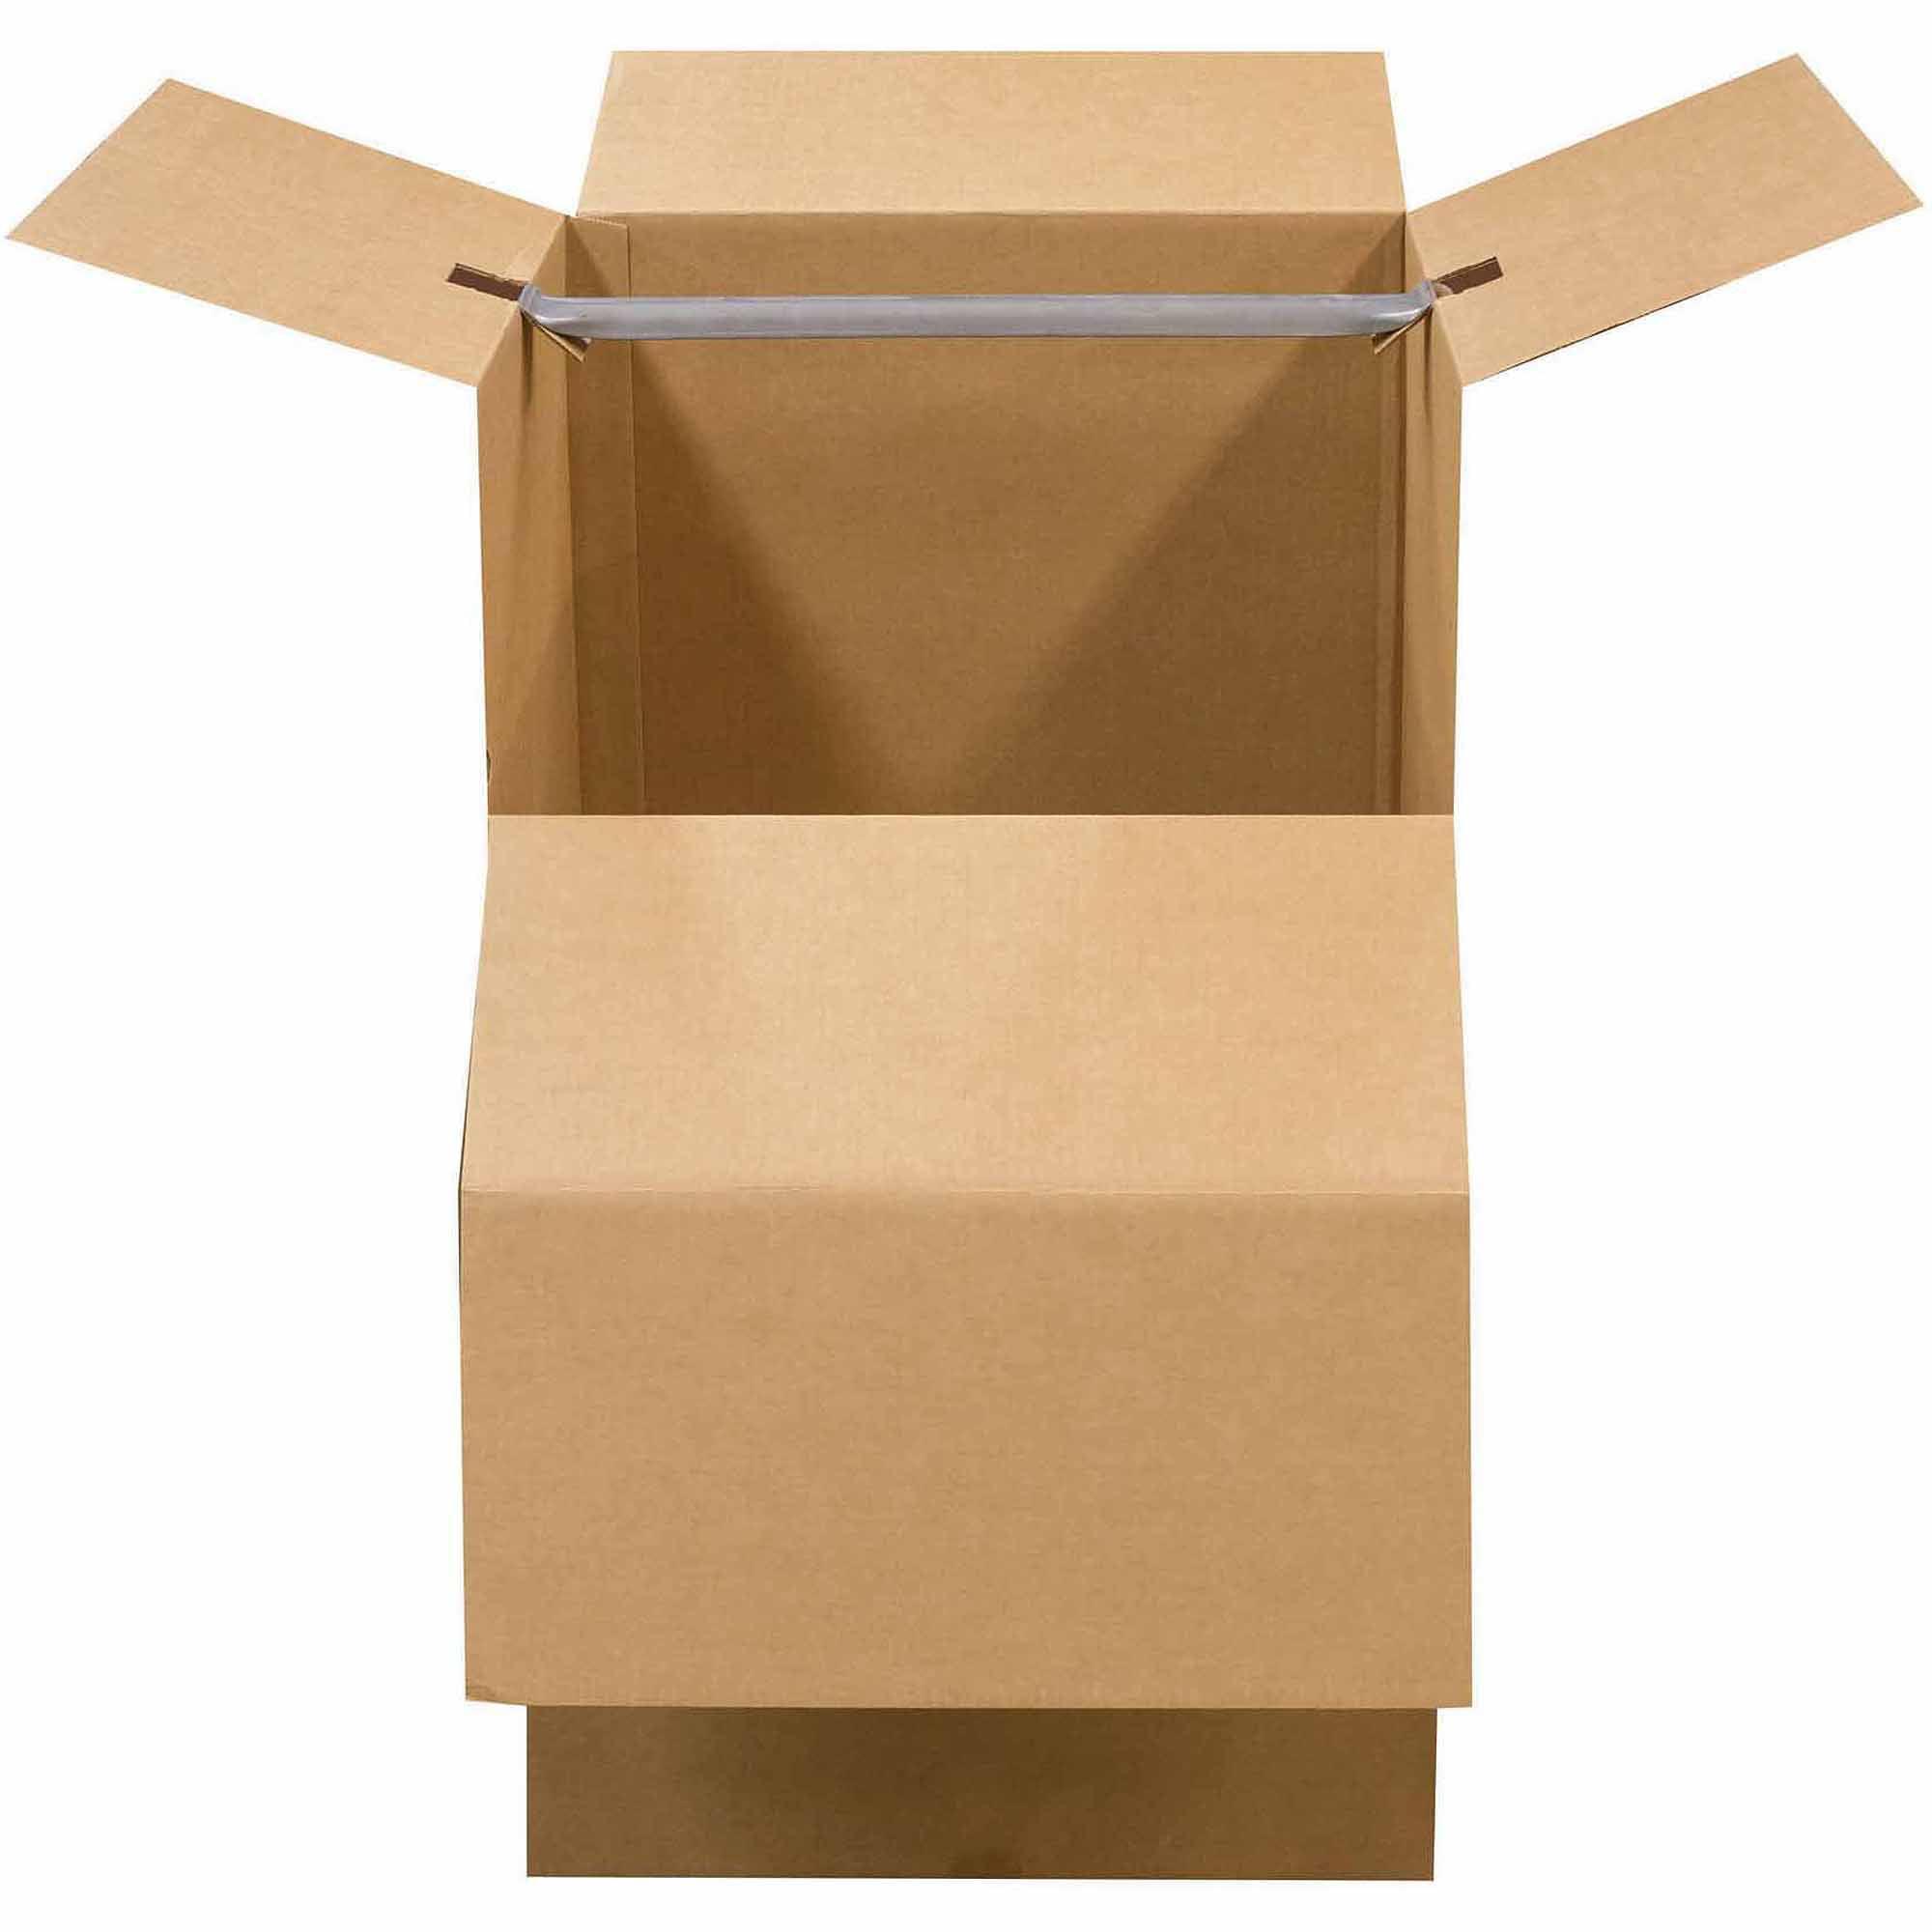 Bankers Box SmoothMove Wardrobe Box 1 pk Walmart